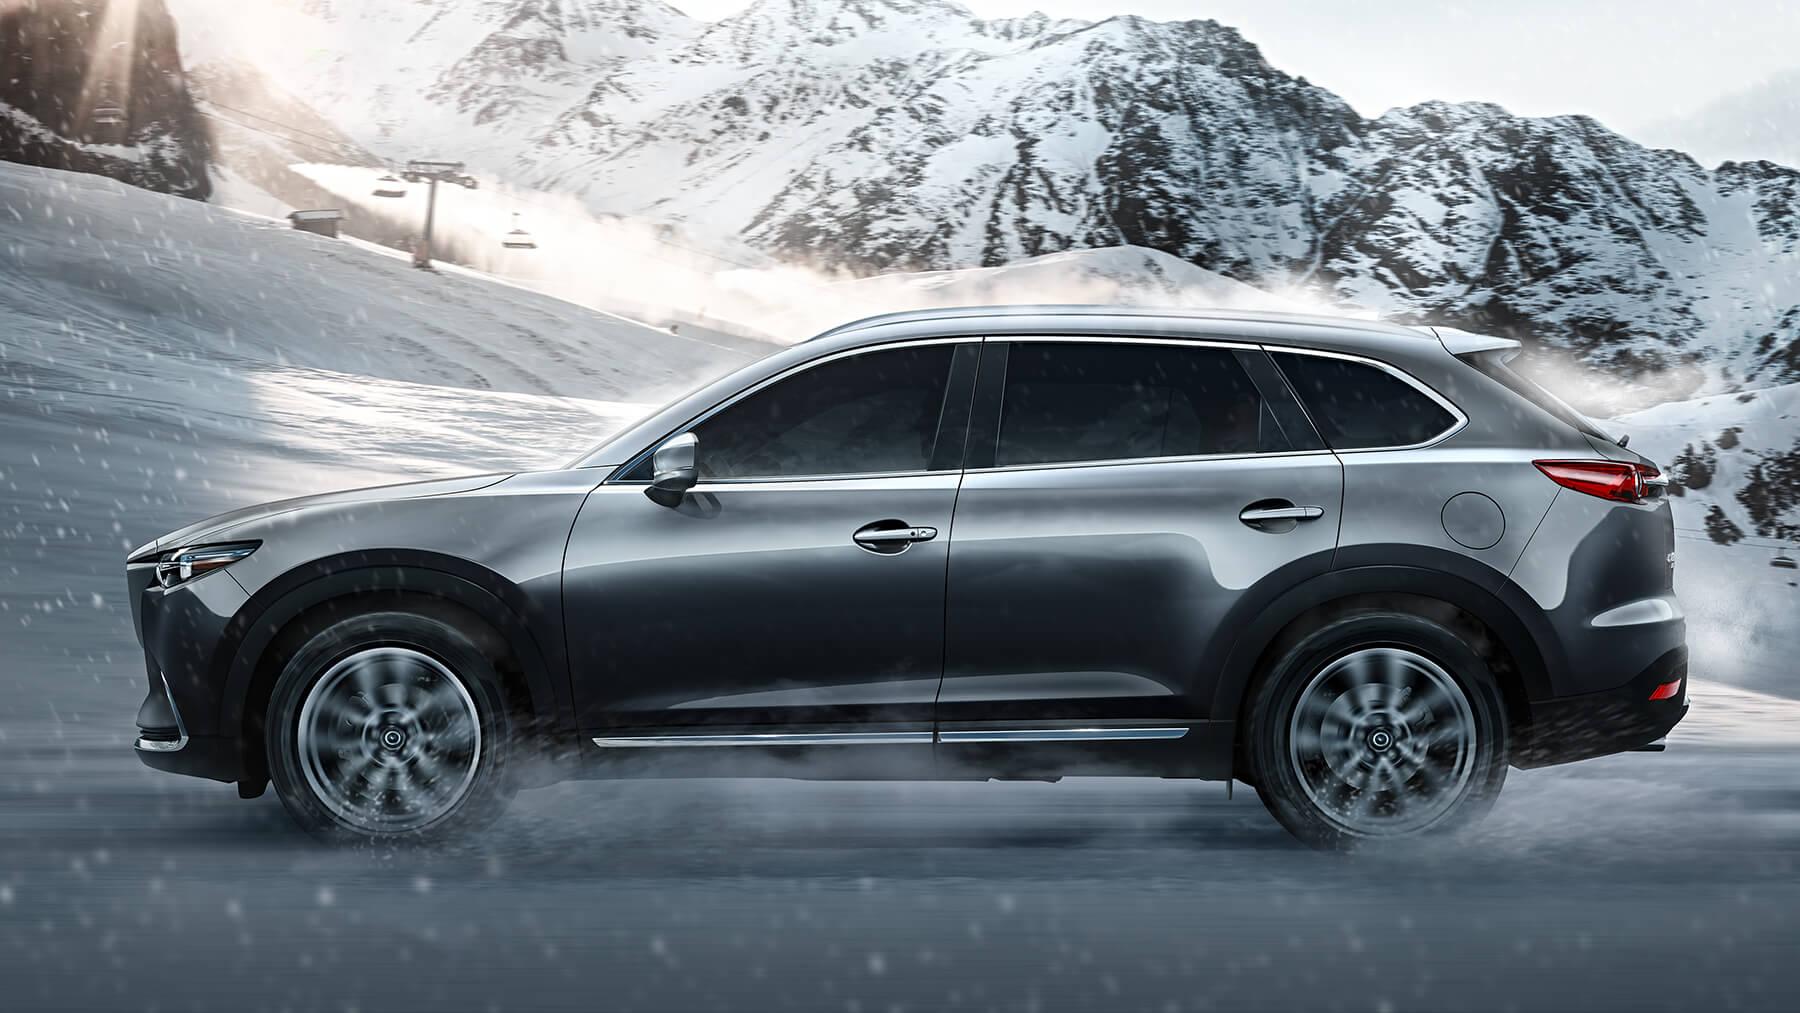 2016-cx9-machine-grey-driving-snow-mde-cx9-gallery